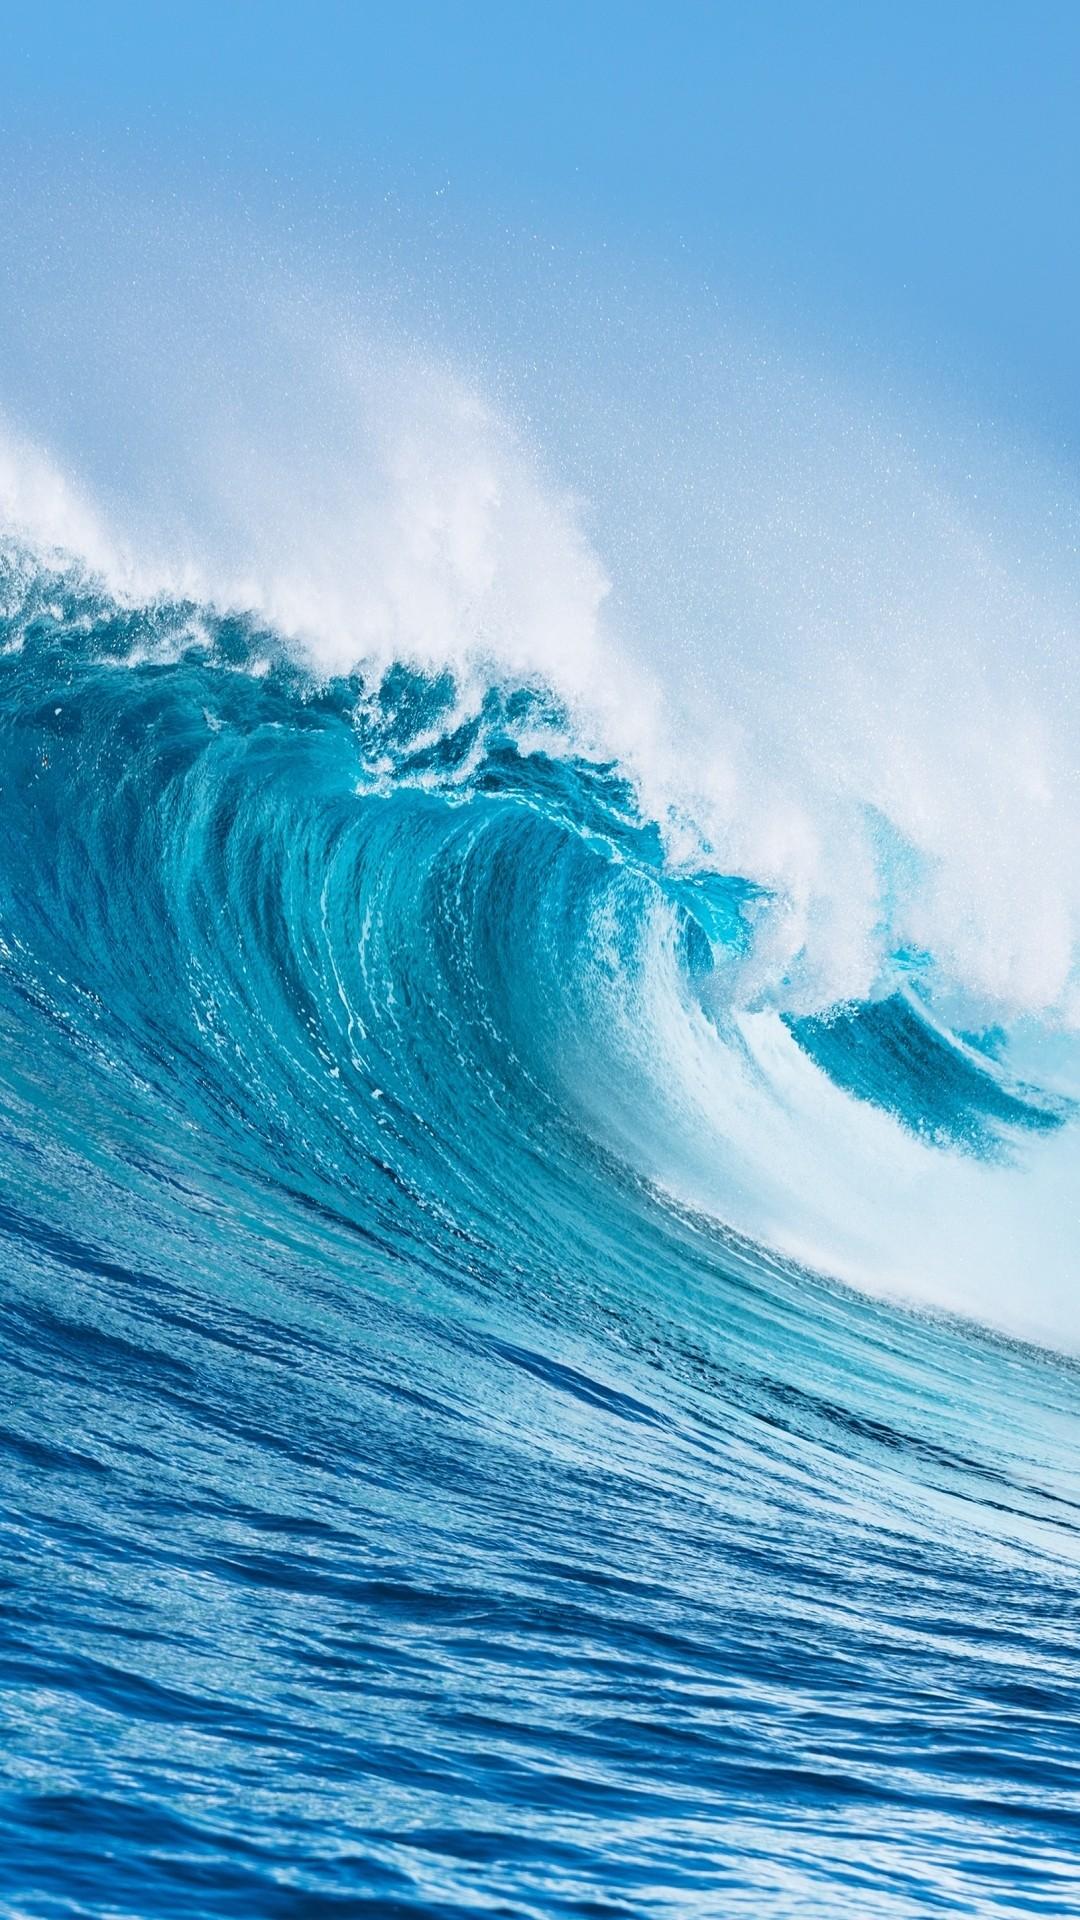 Ocean Waves hd wallpaper for iphone